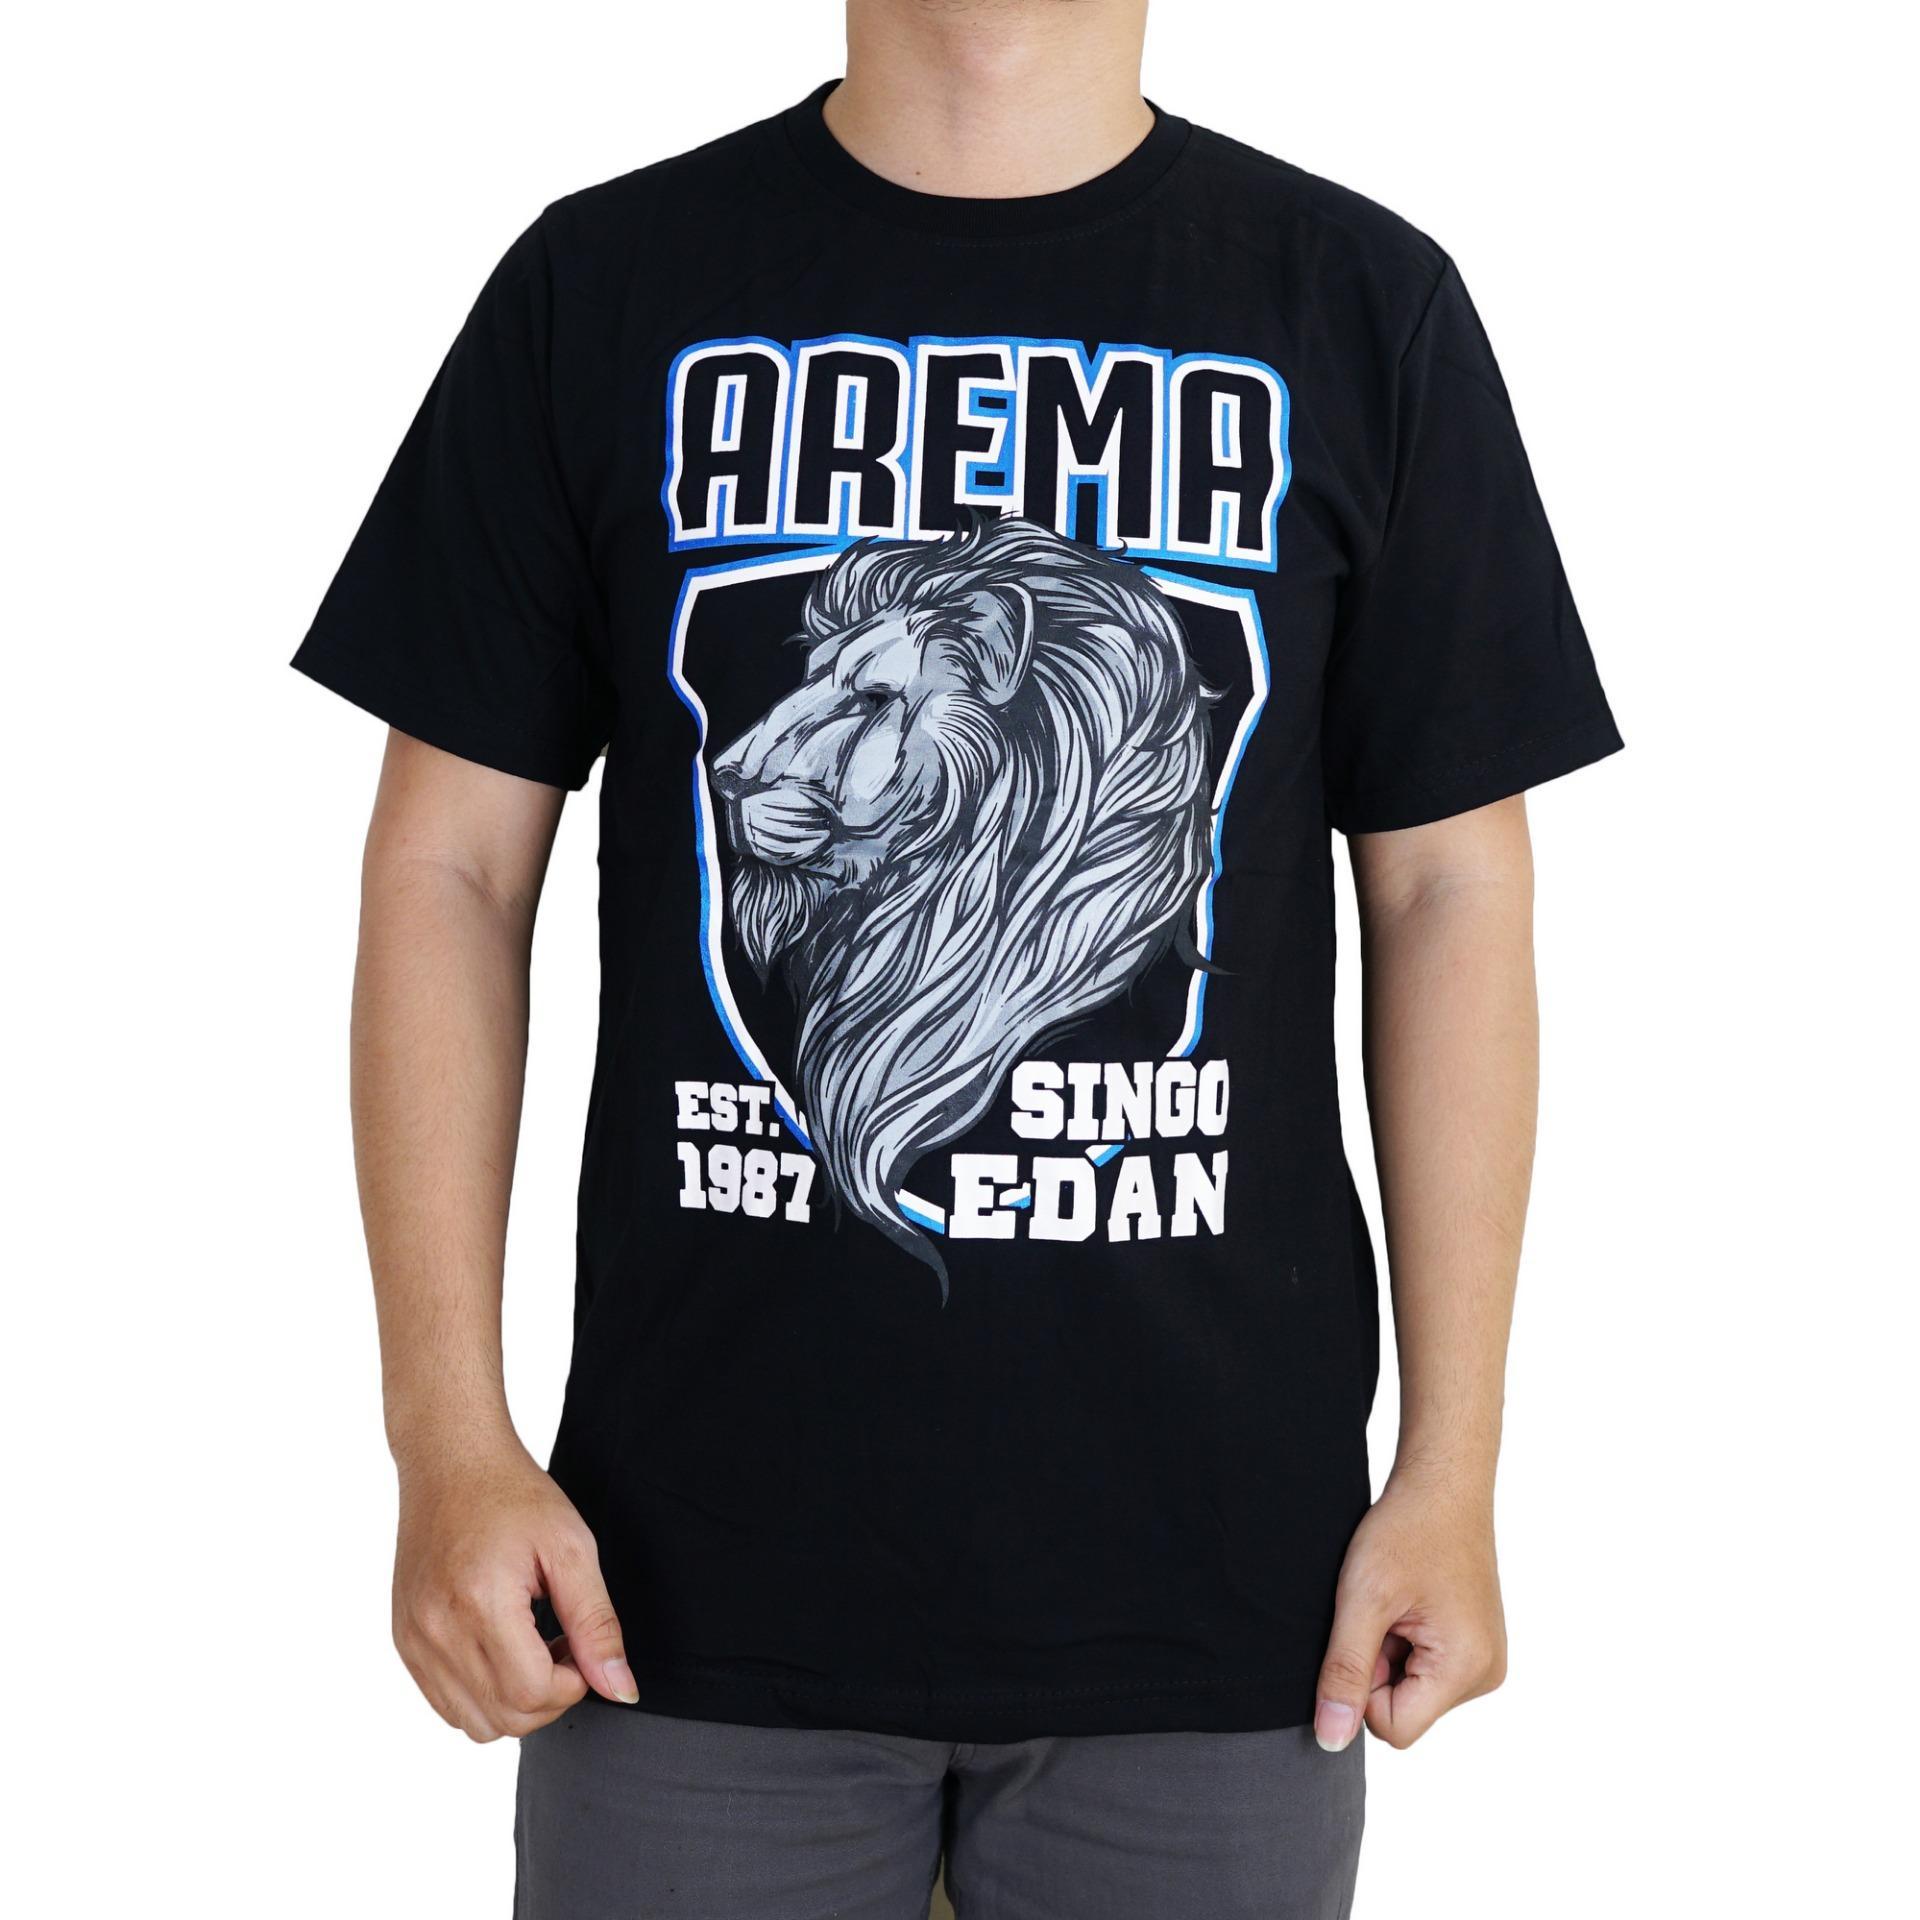 Vanwin – Kaos T-Shirt Distro / kaos Pria / Tshirt Pria / Distro Pria / Baju Pria Premium Football Arema Medan – Hitam